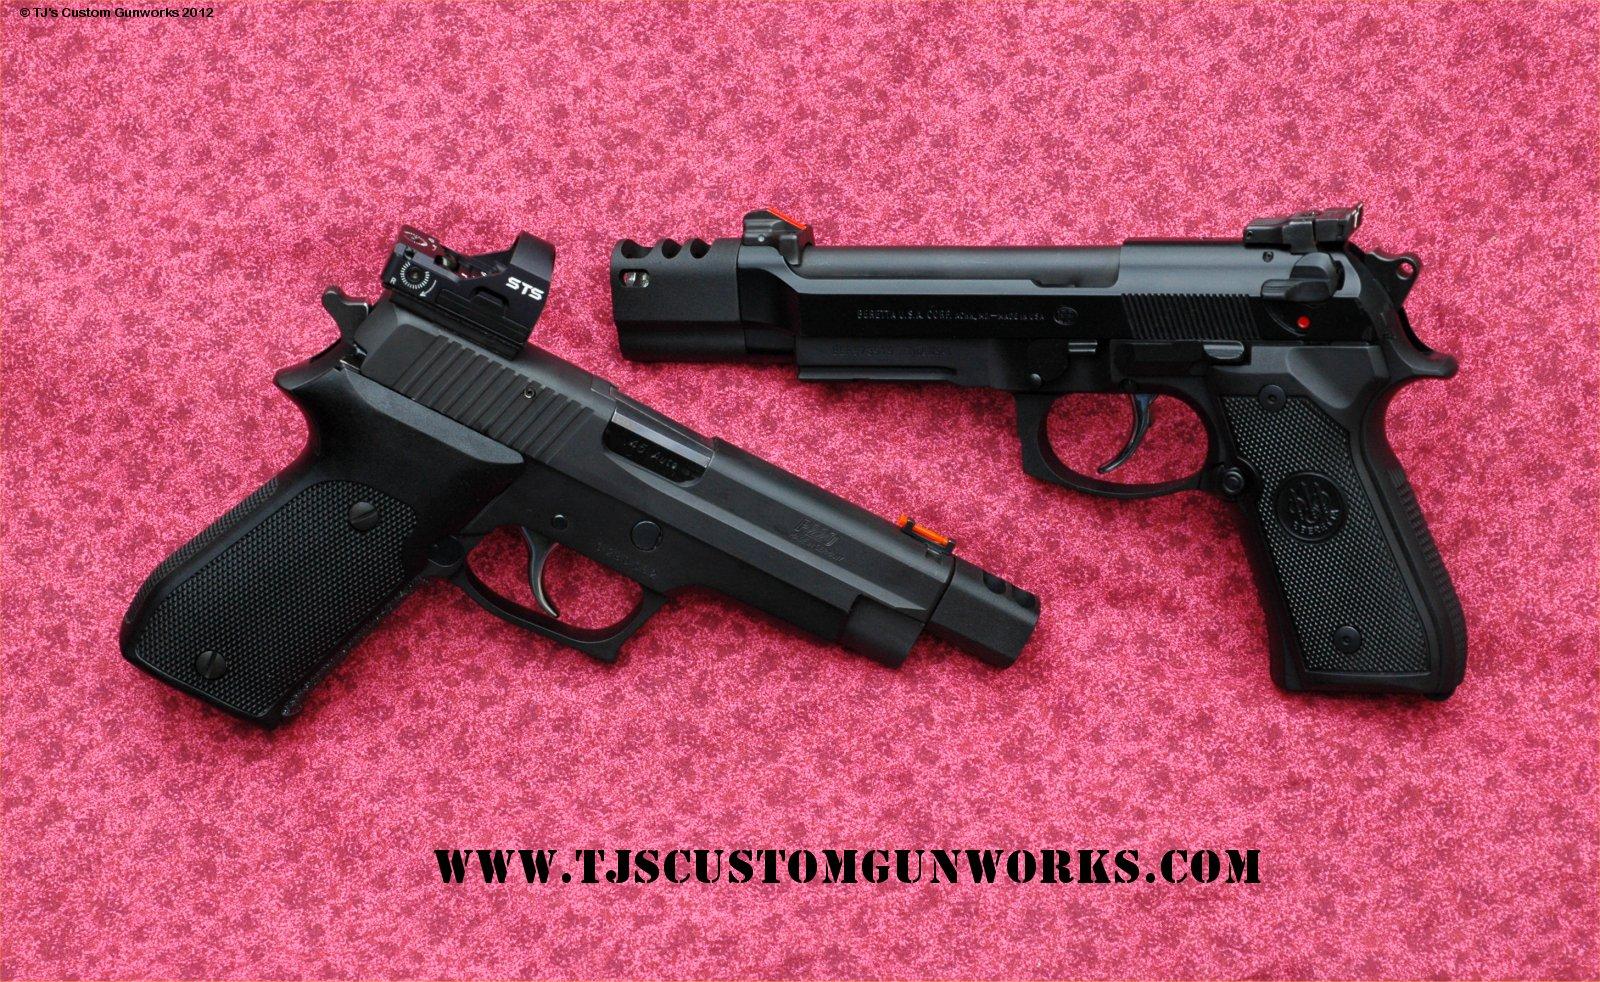 Custom Compensated Beretta M992fs Sig Sauer P220